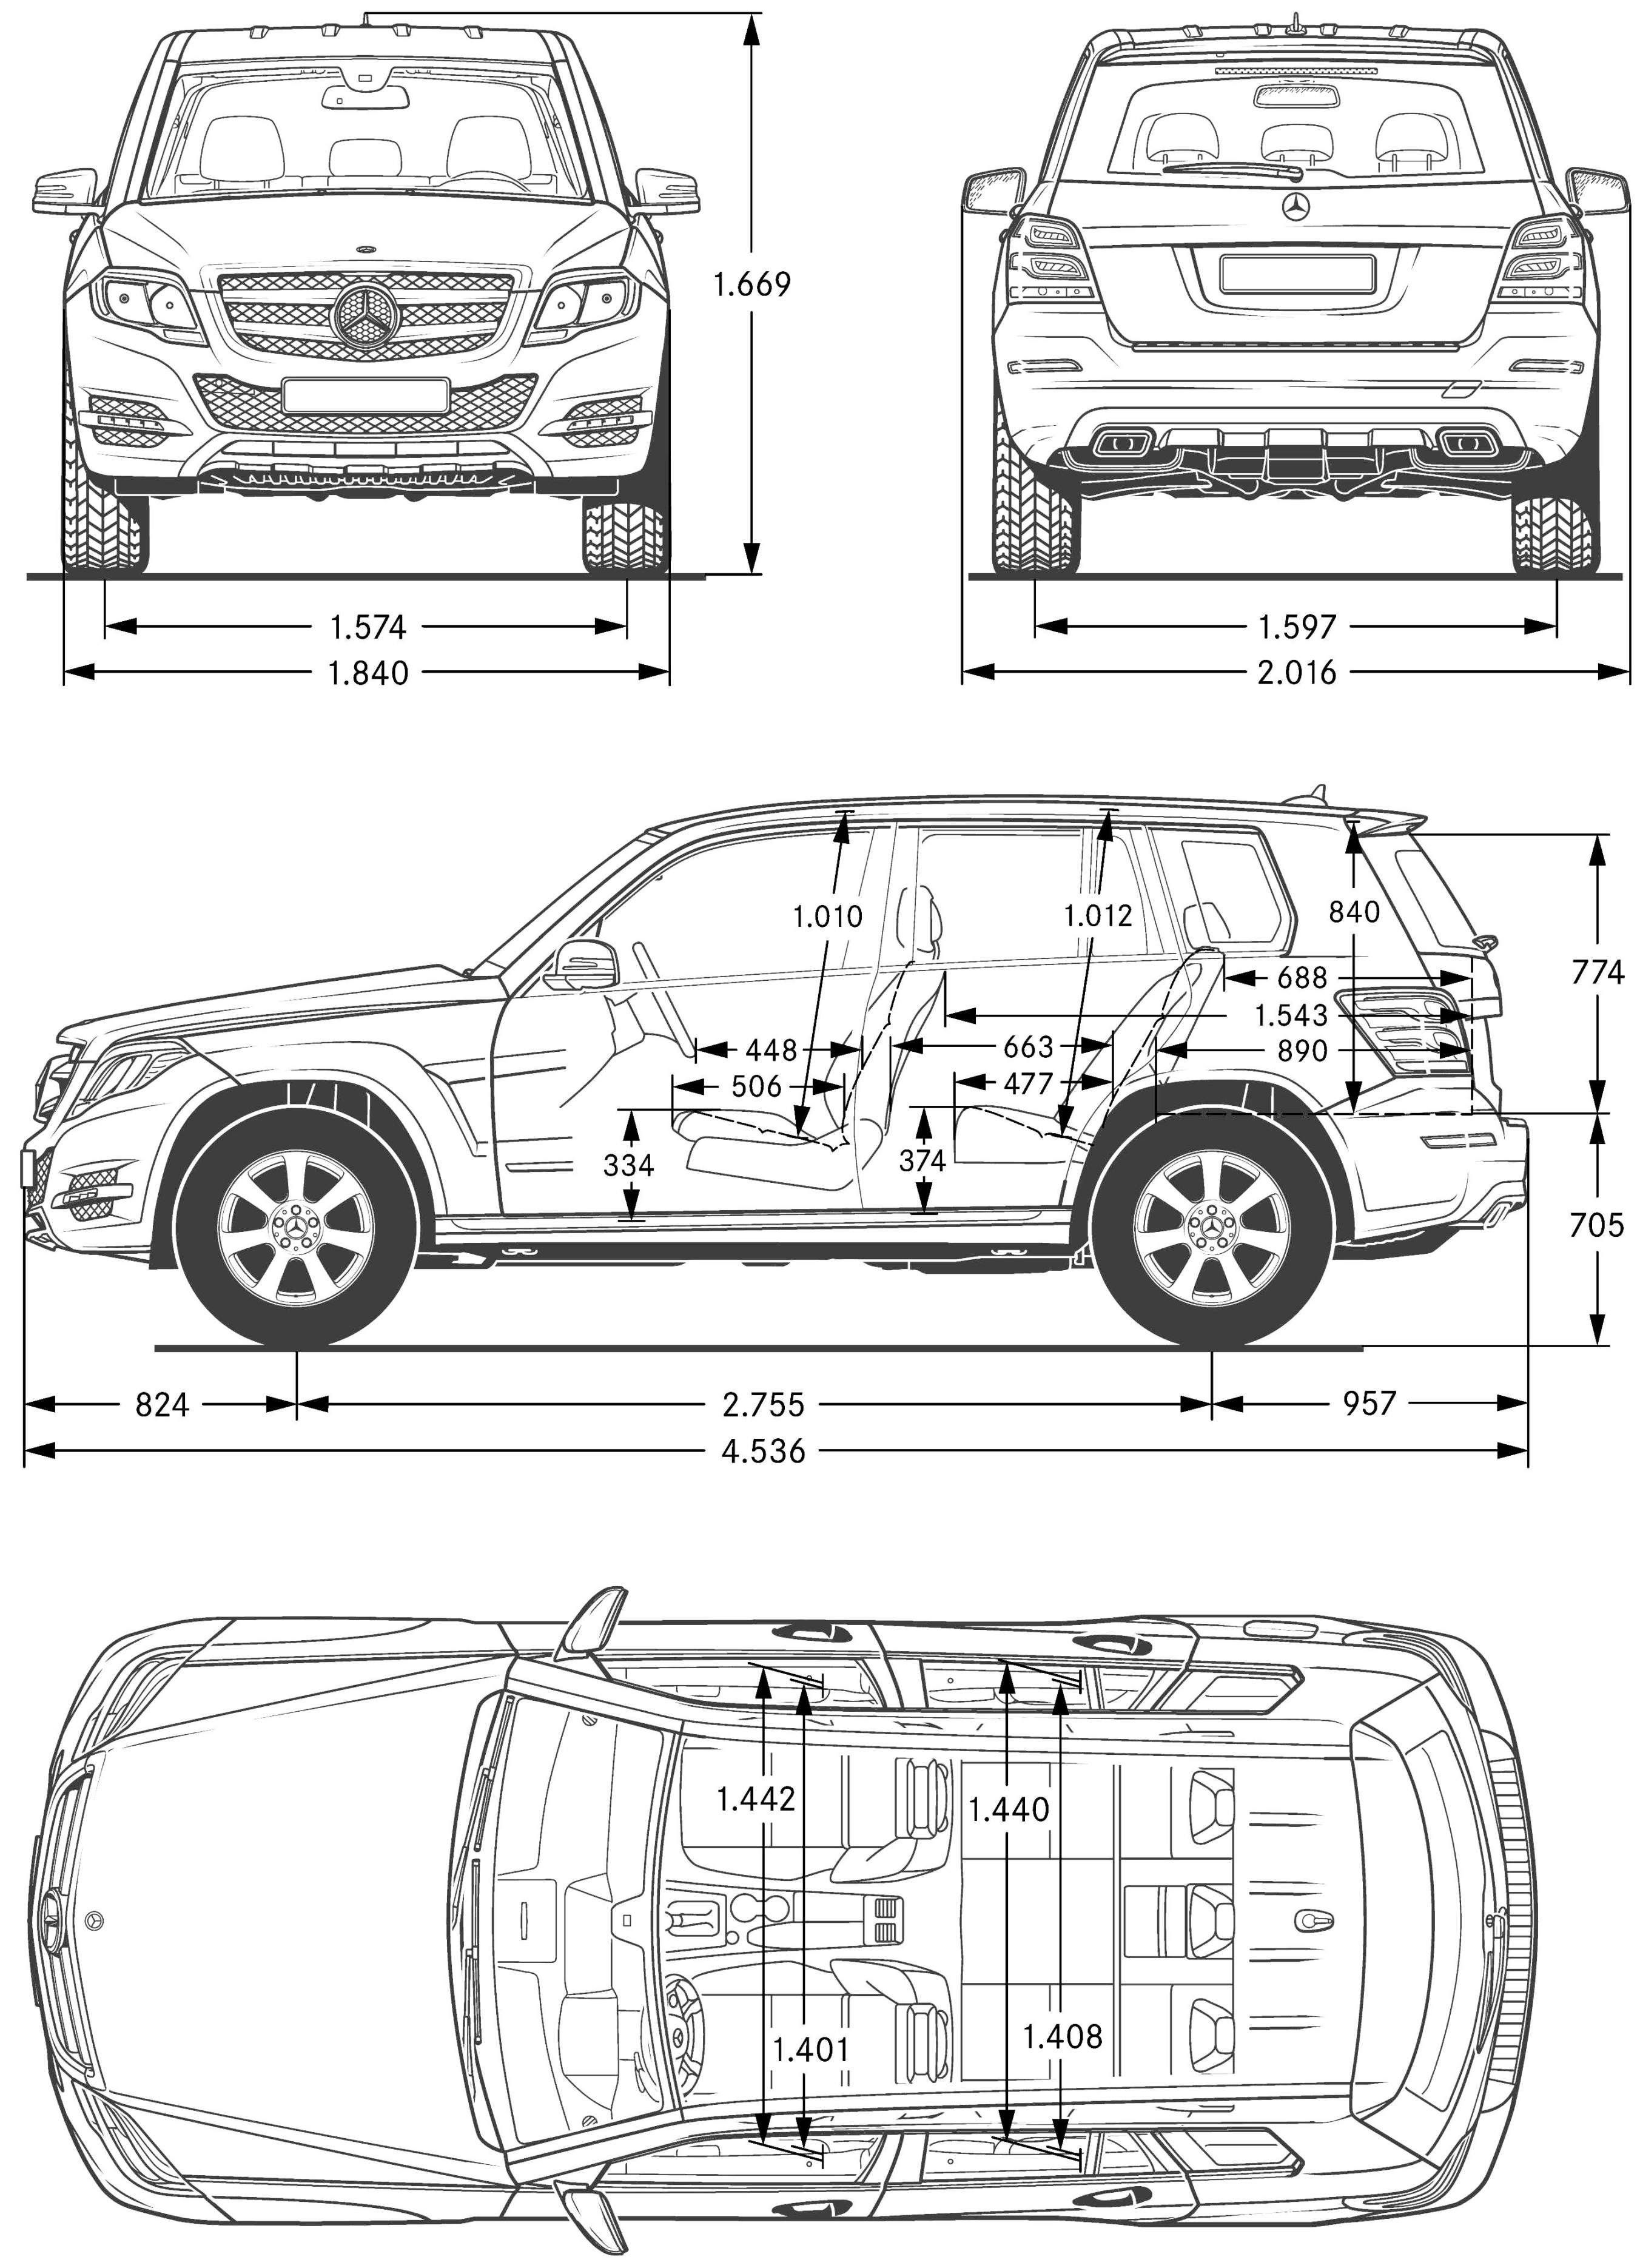 Mercedes benzglk class blueprint database pinterest planos mercedes benzglk class malvernweather Gallery